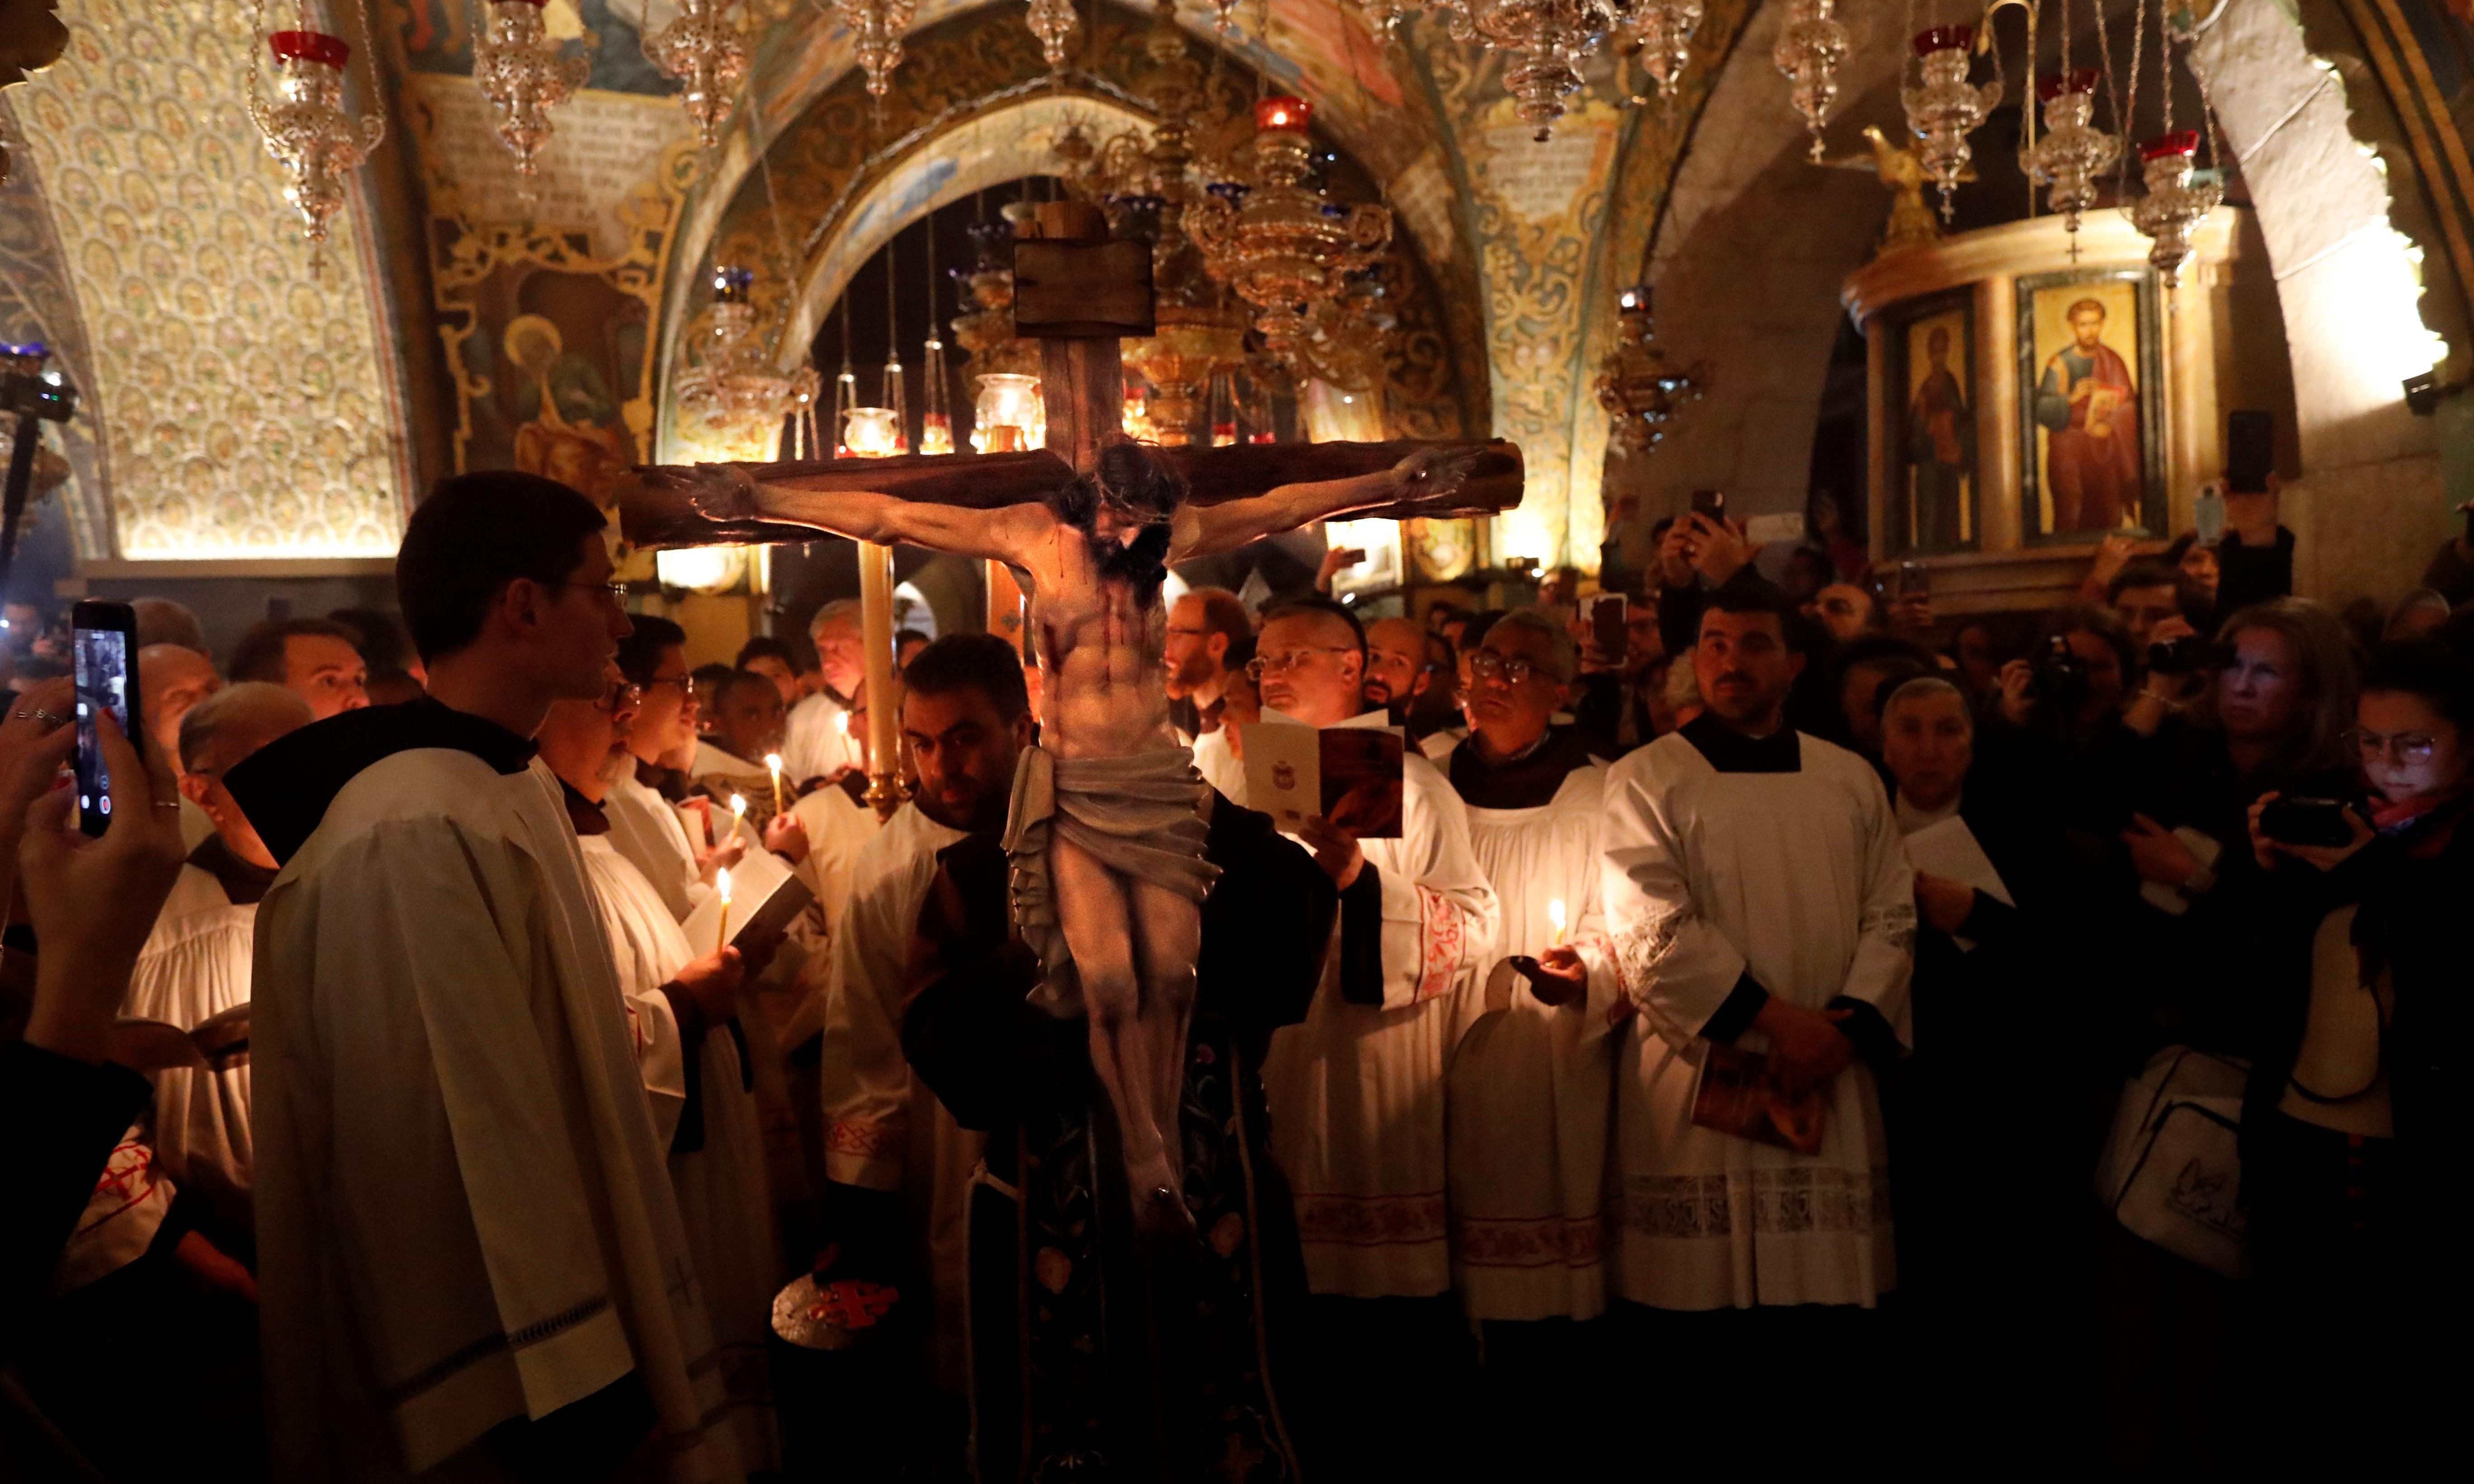 Gaza Christians wait for permits to visit Jerusalem and Bethlehem at Easter